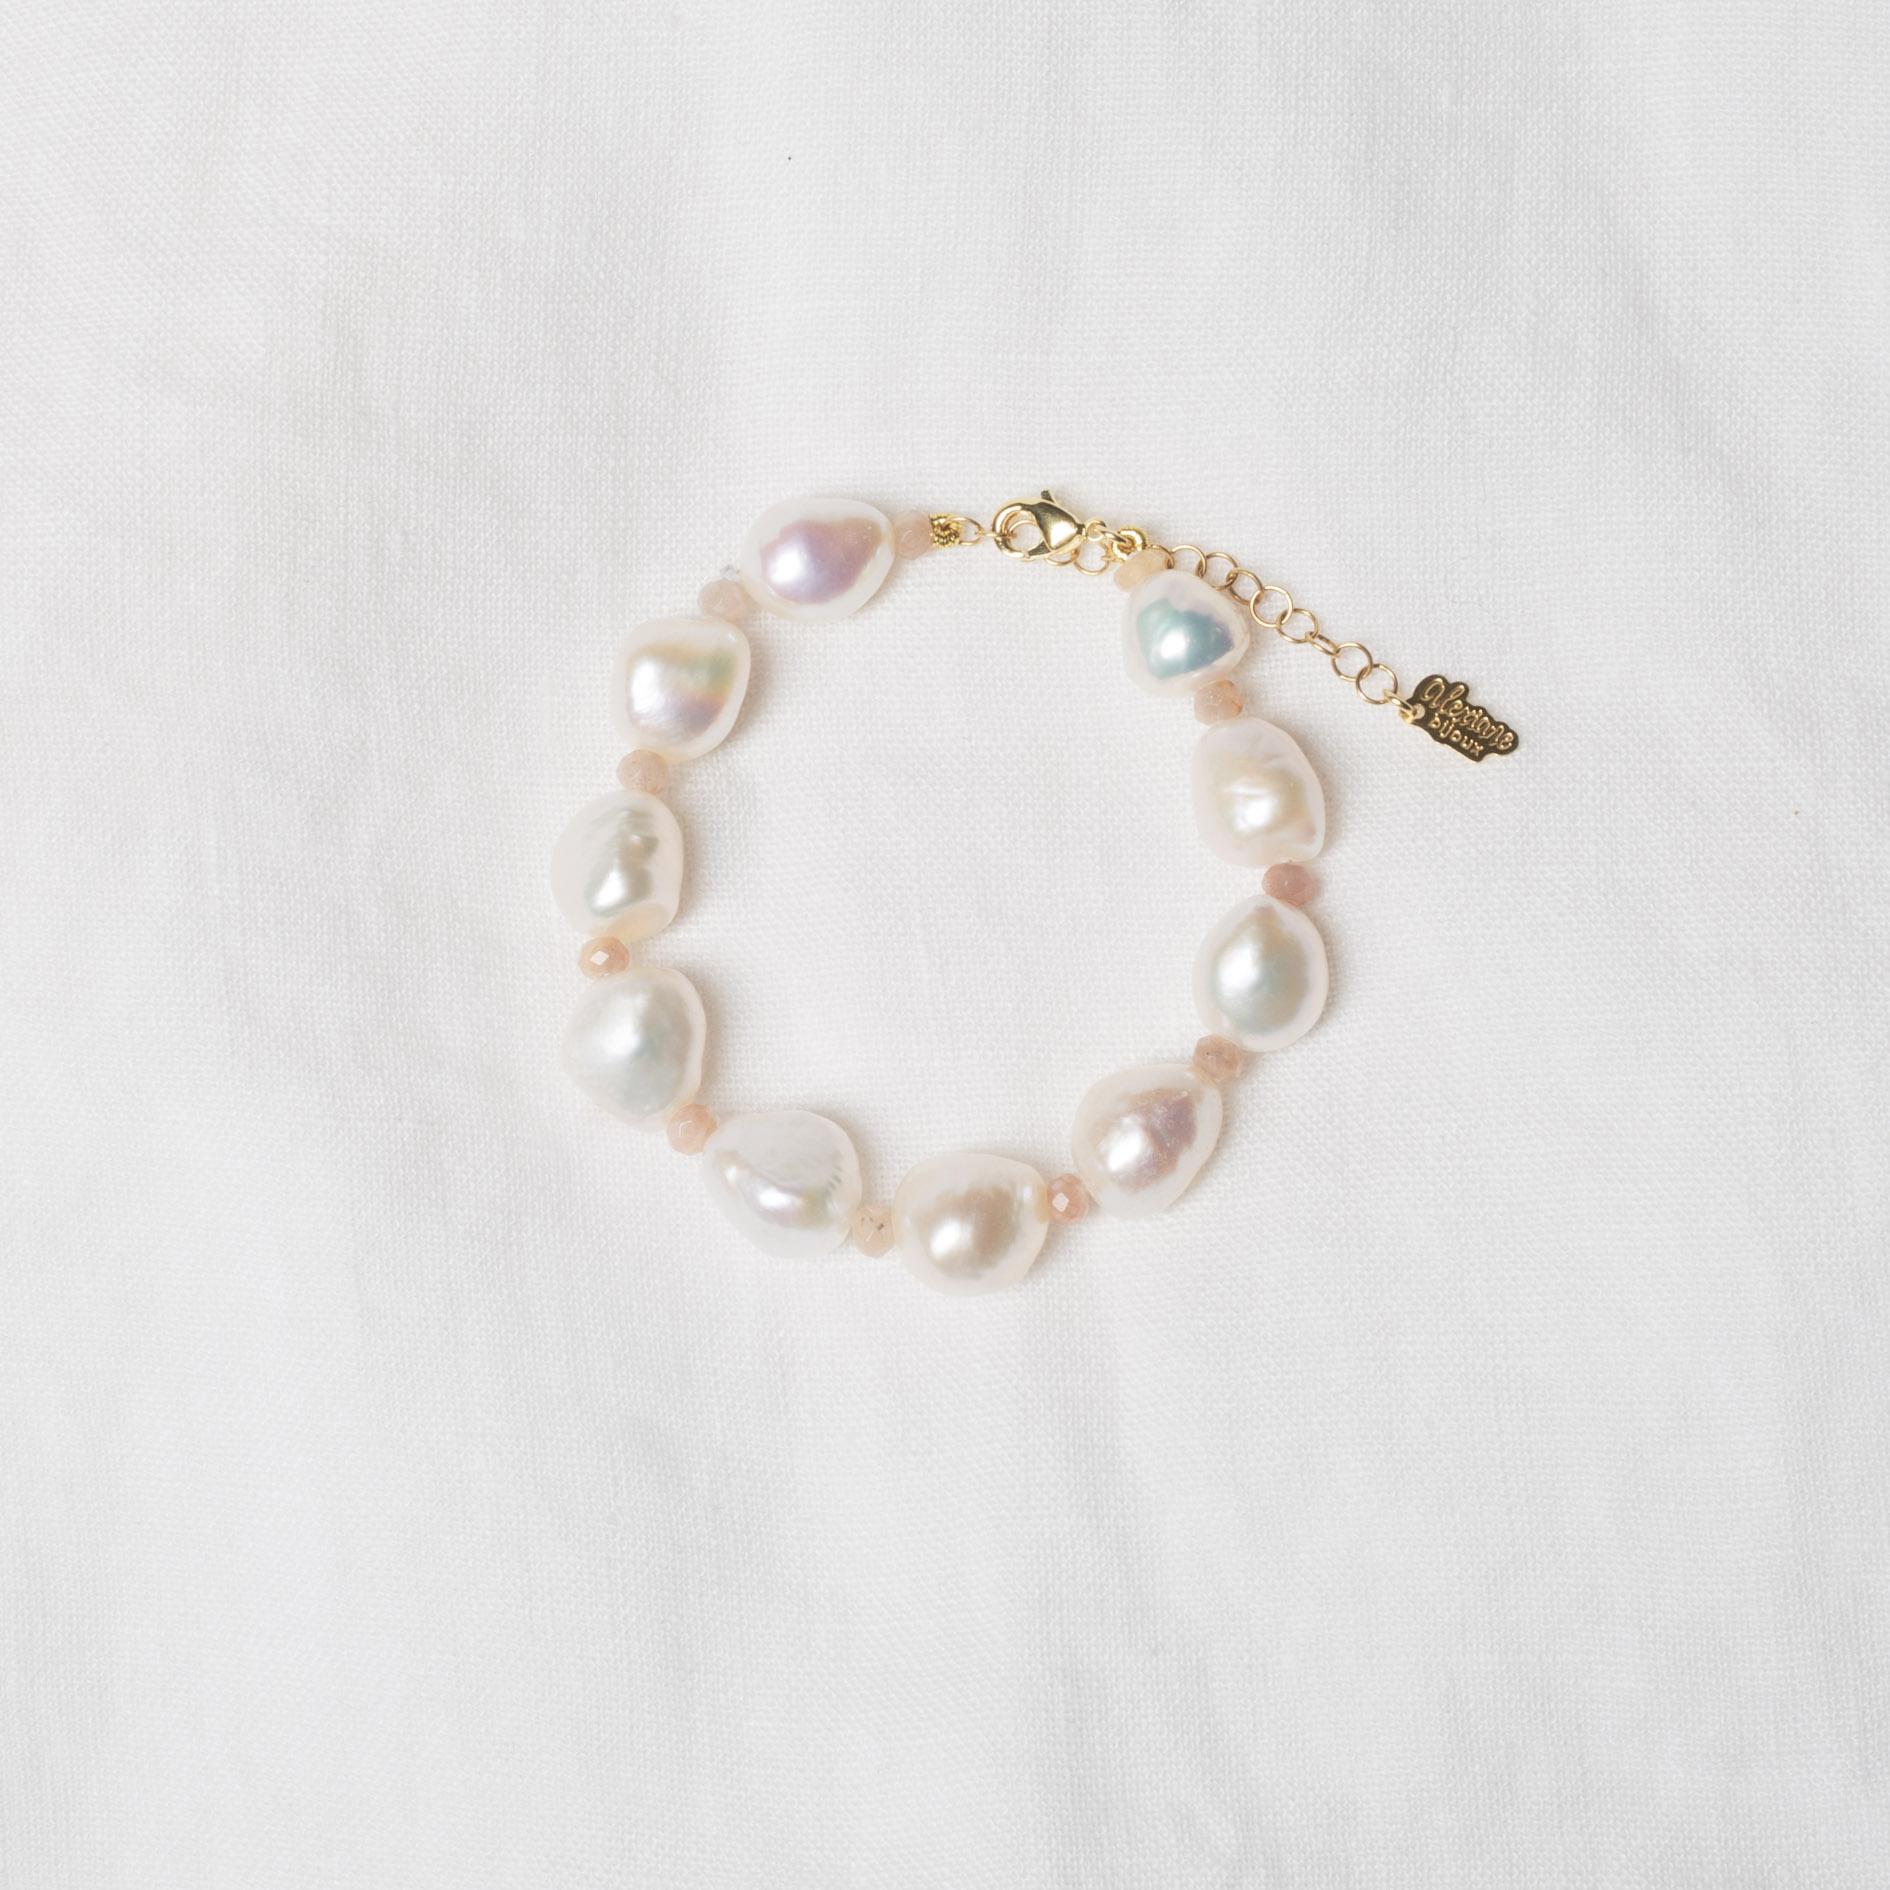 Bracelet, bijoux, or, Bagues, Cocooning, Colliers